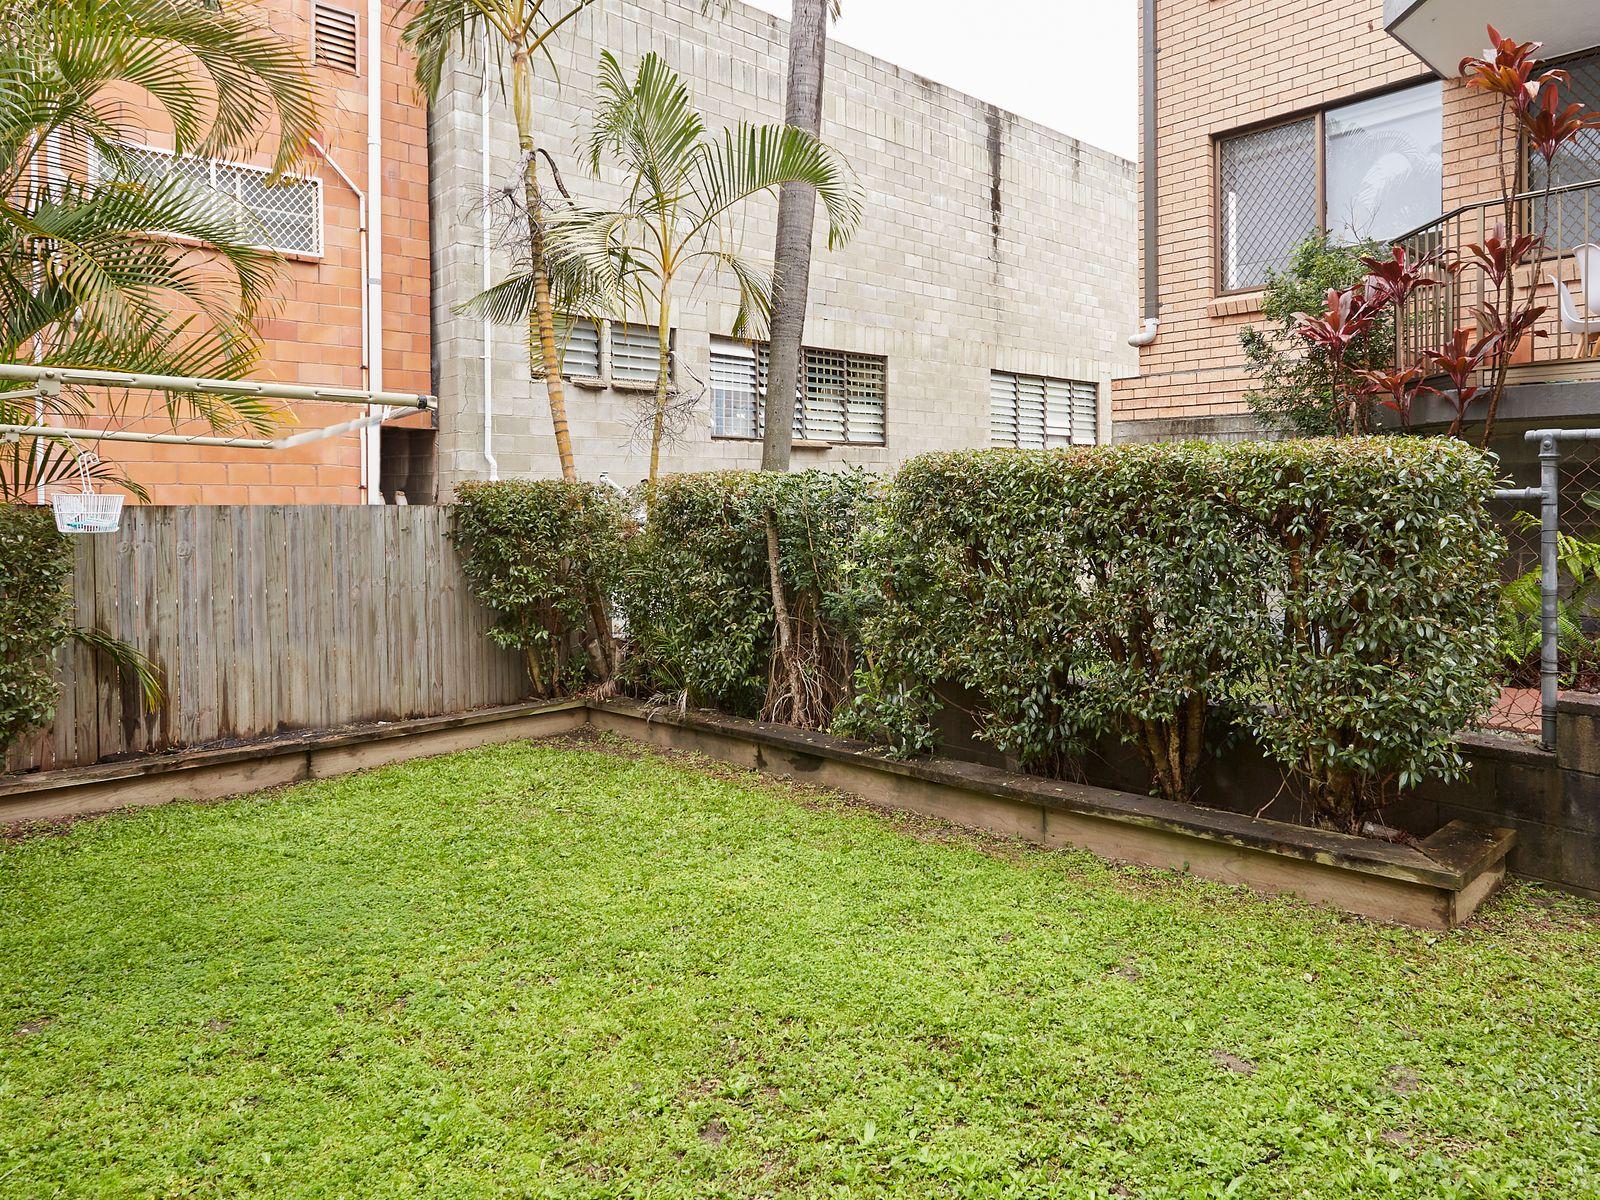 1/22 Stephens Street, Burleigh Heads, QLD 4220